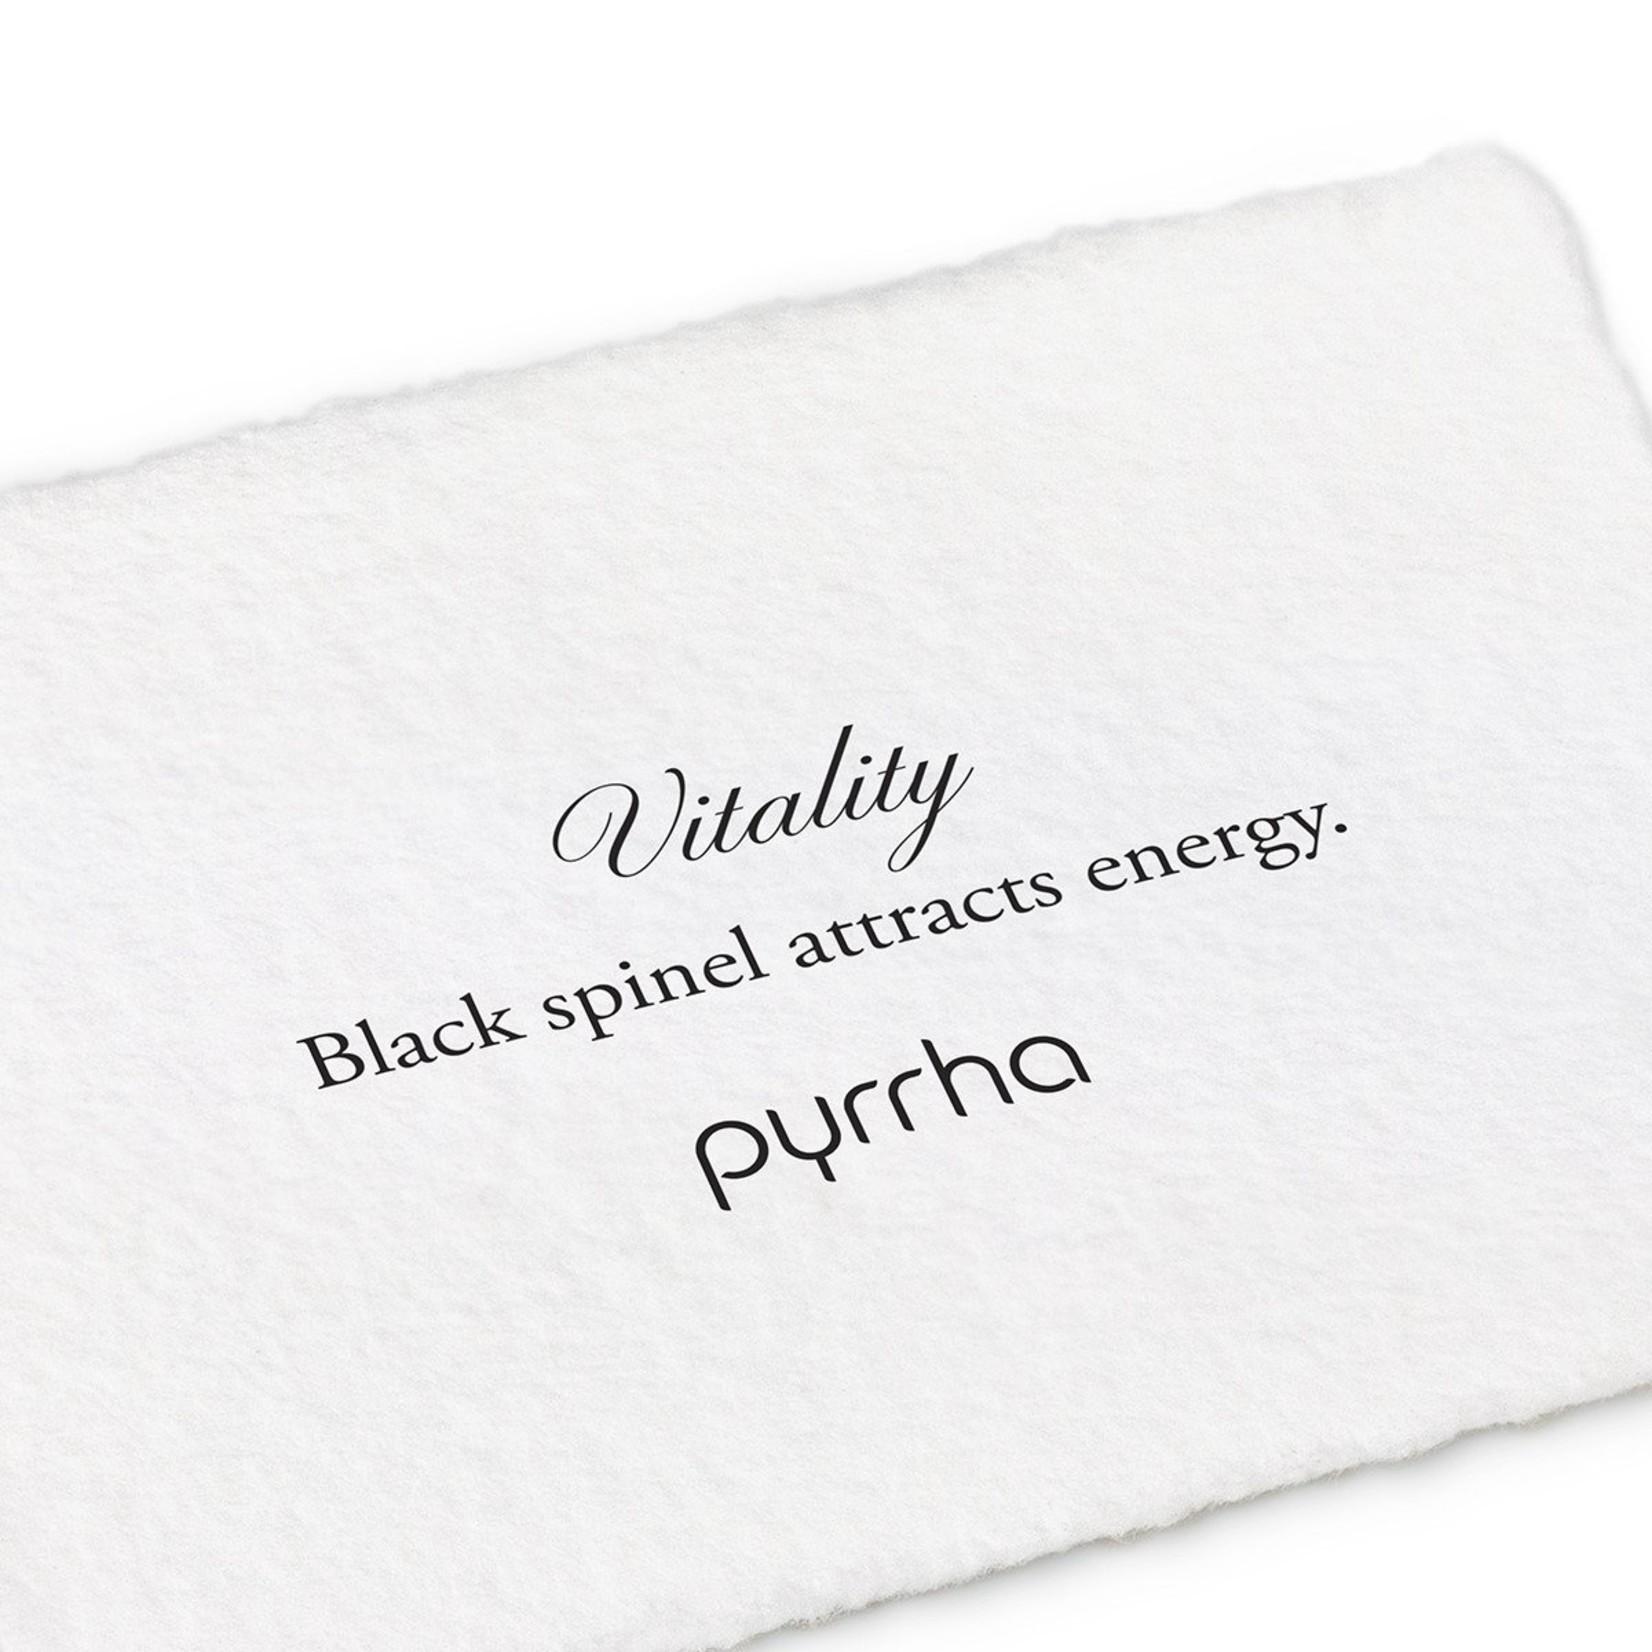 Pyrrha Vitality Signature Attraction Charm